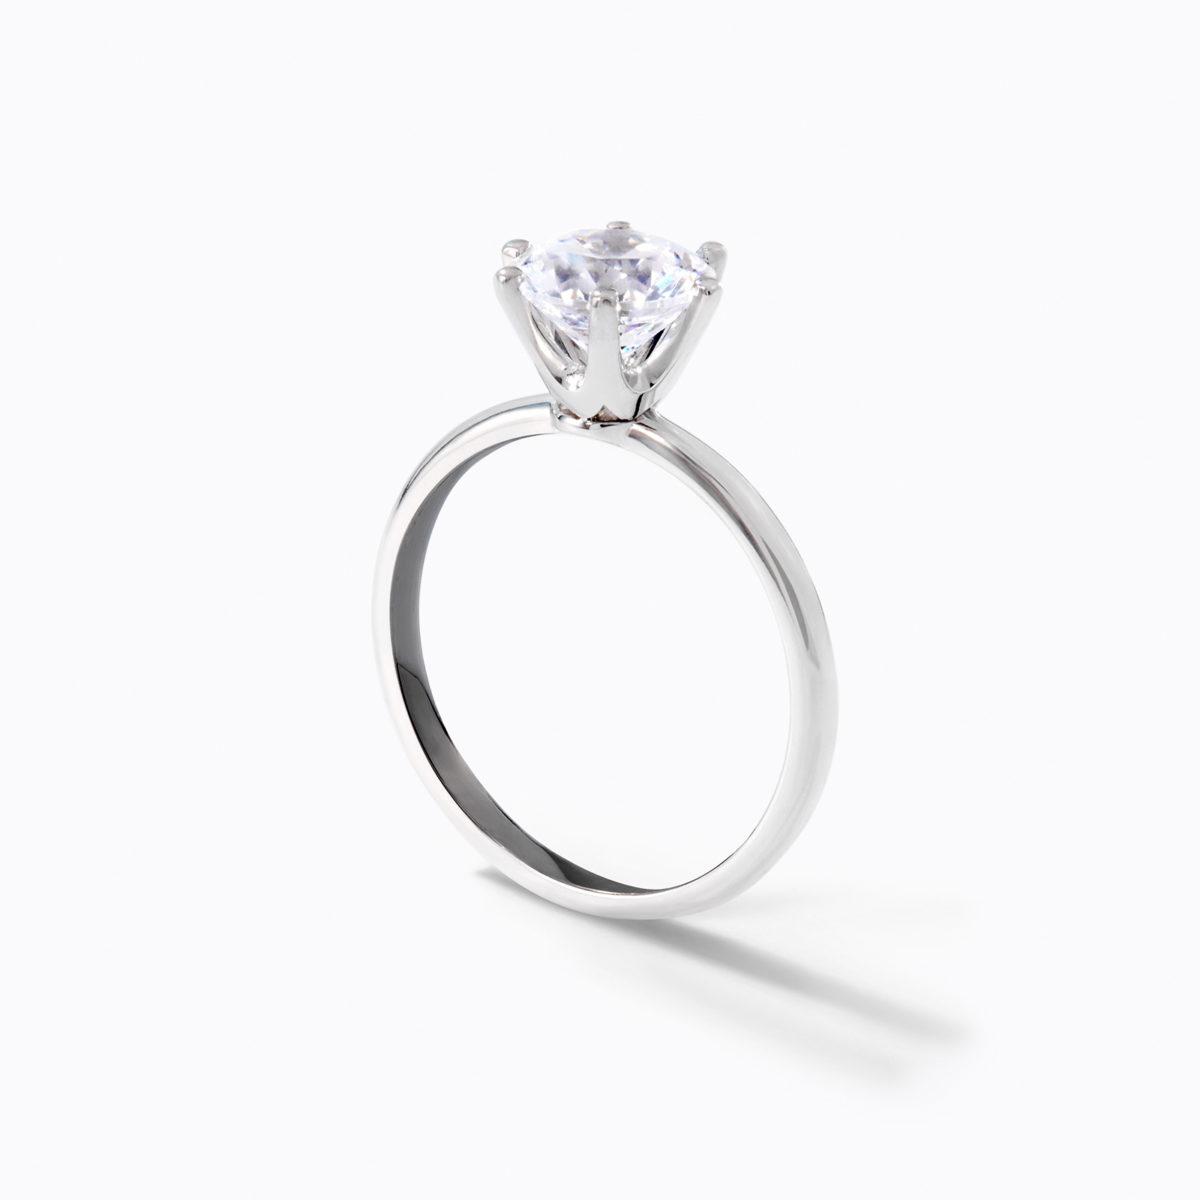 Ludbrook-for-Bensimon-Diamonds-01